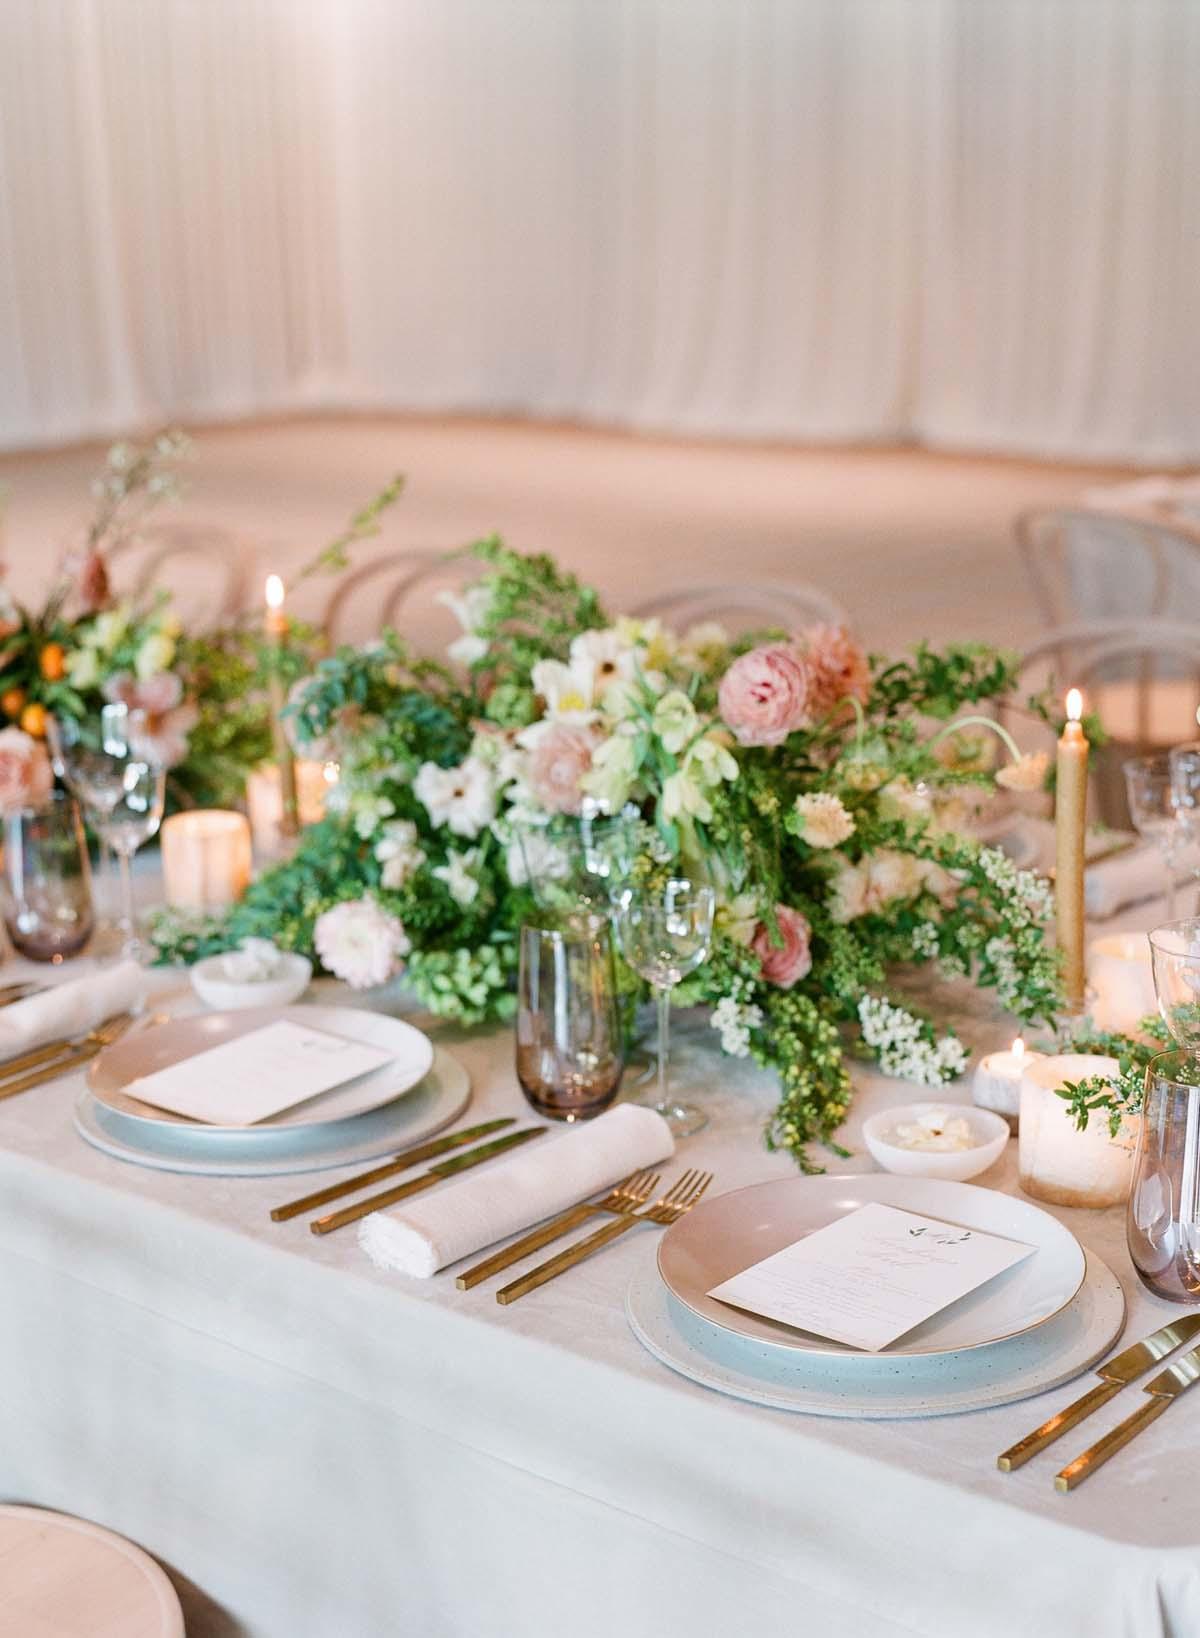 XOXO_BRIDE_Events-Michelle-Beller_Photography_0144